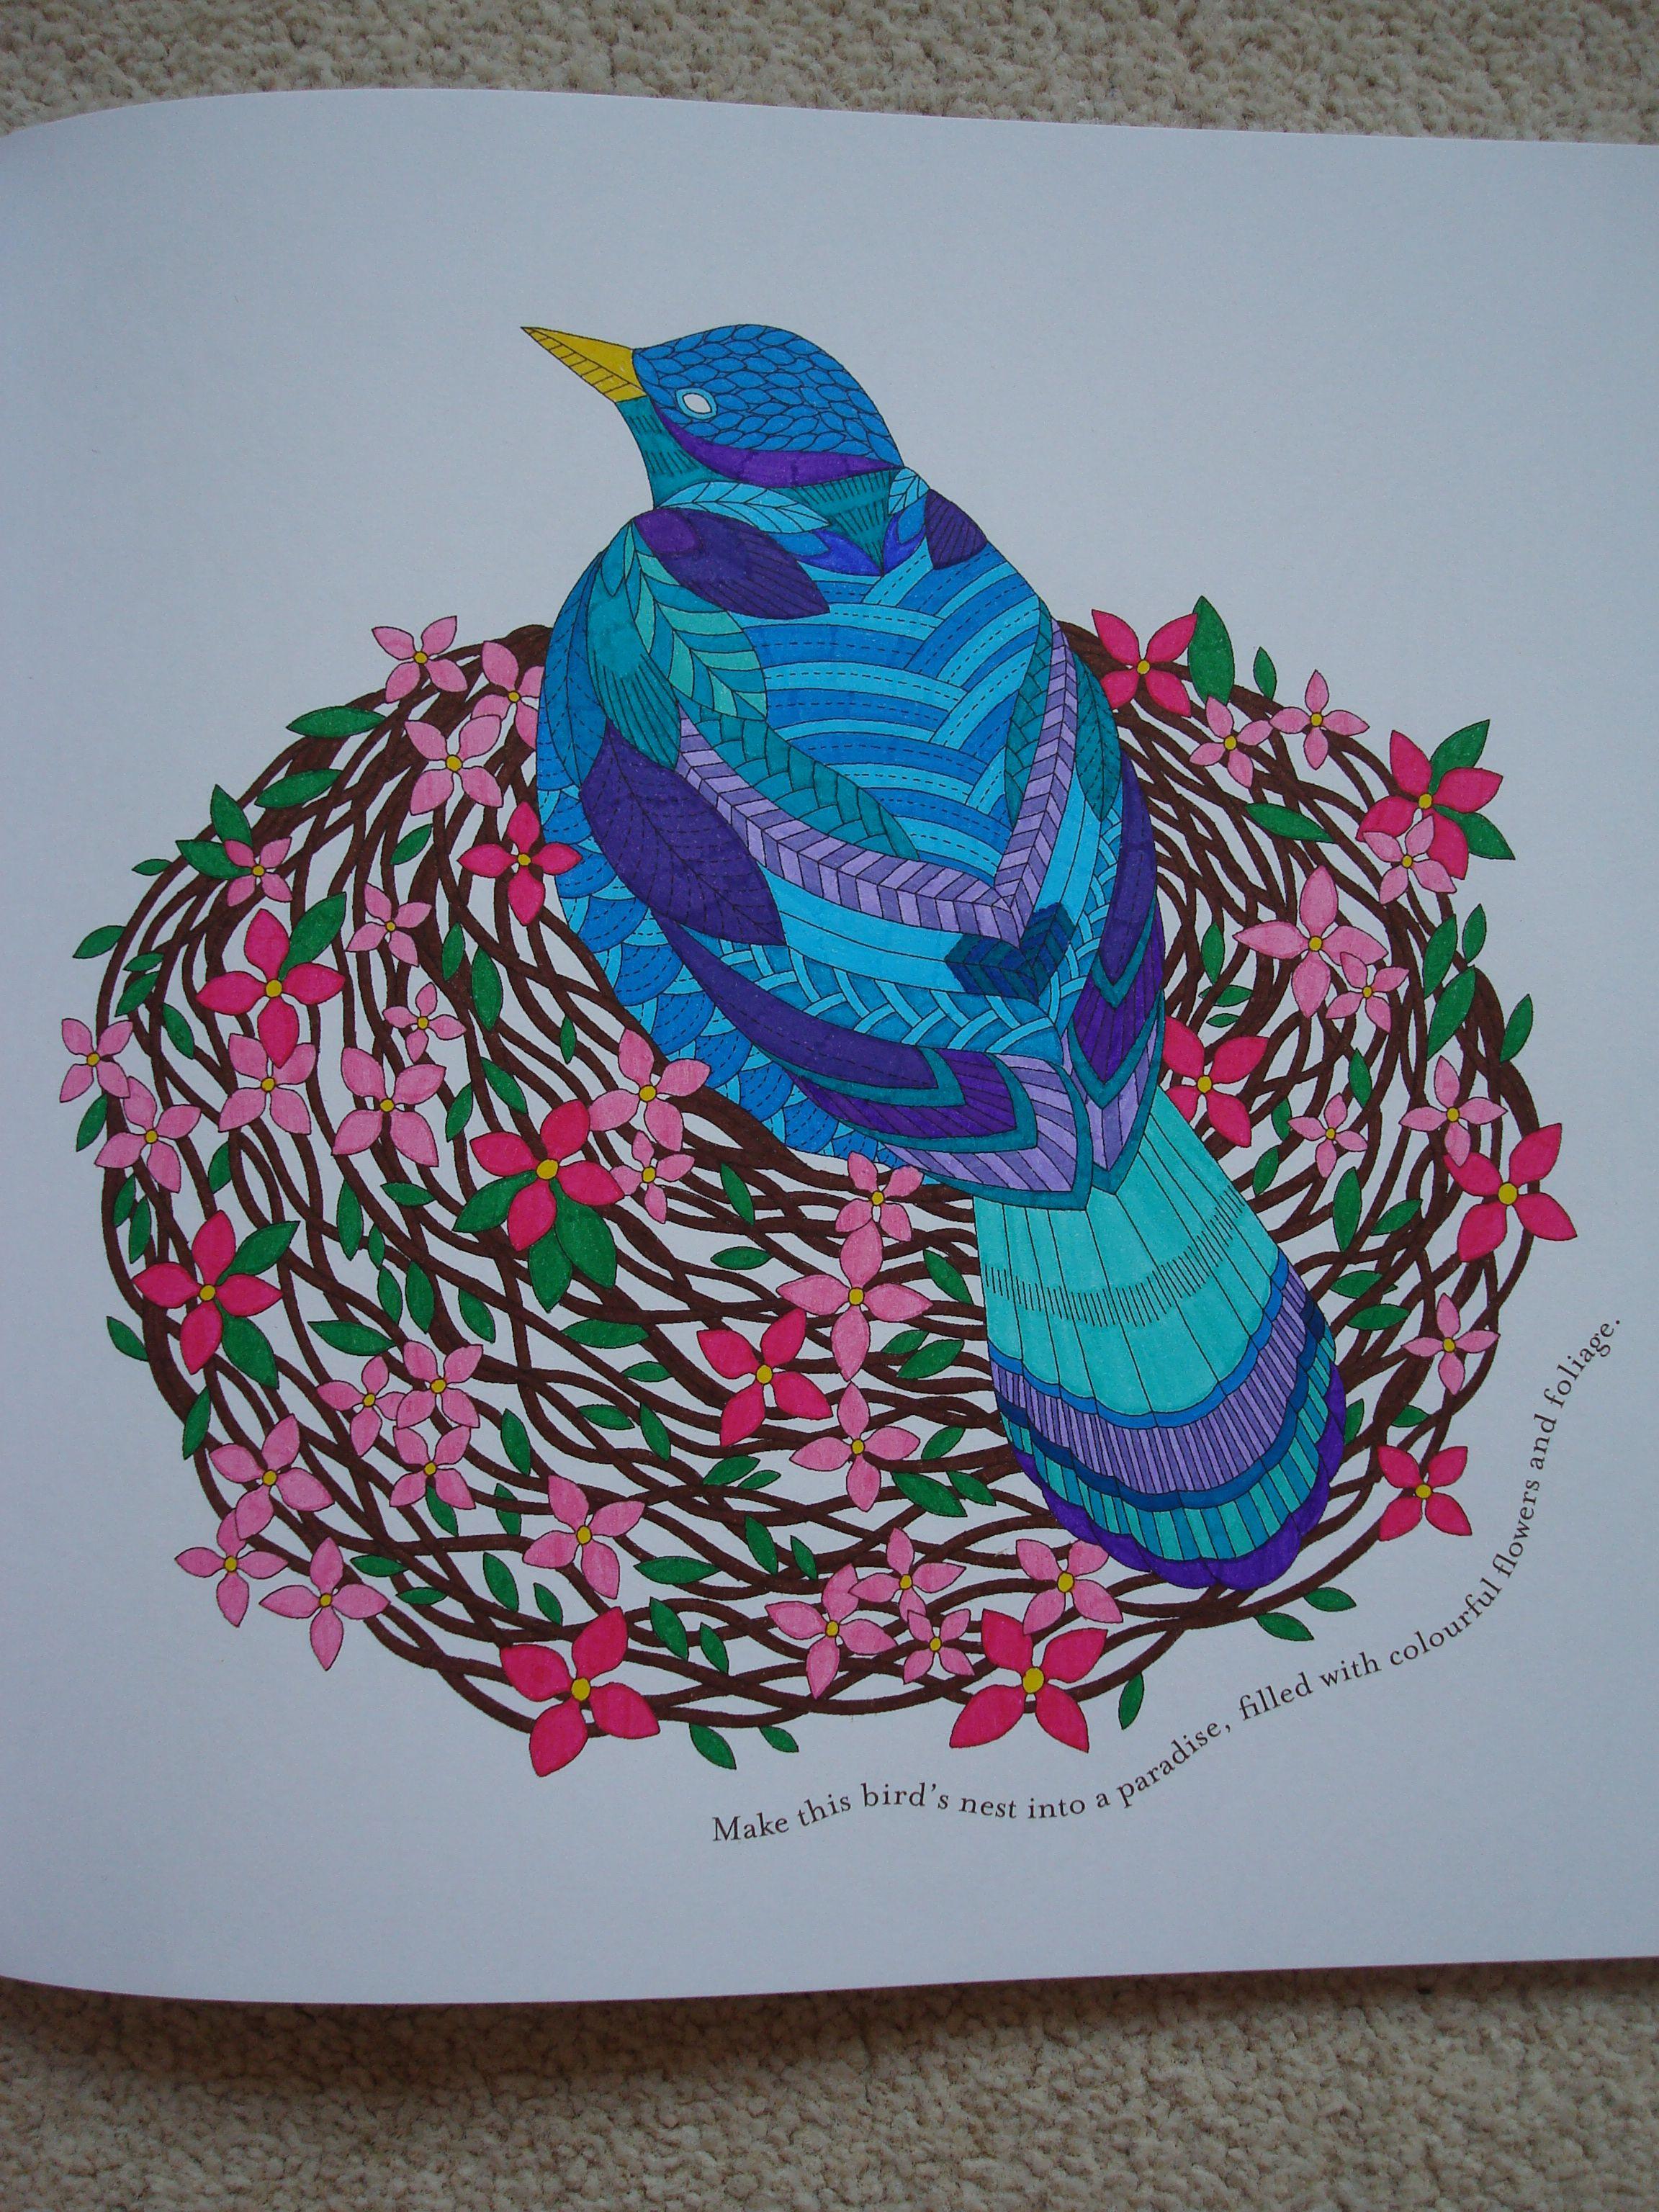 Tropical Wonderland 045 | Millie Marotta.1 | Pinterest | Coloring ...